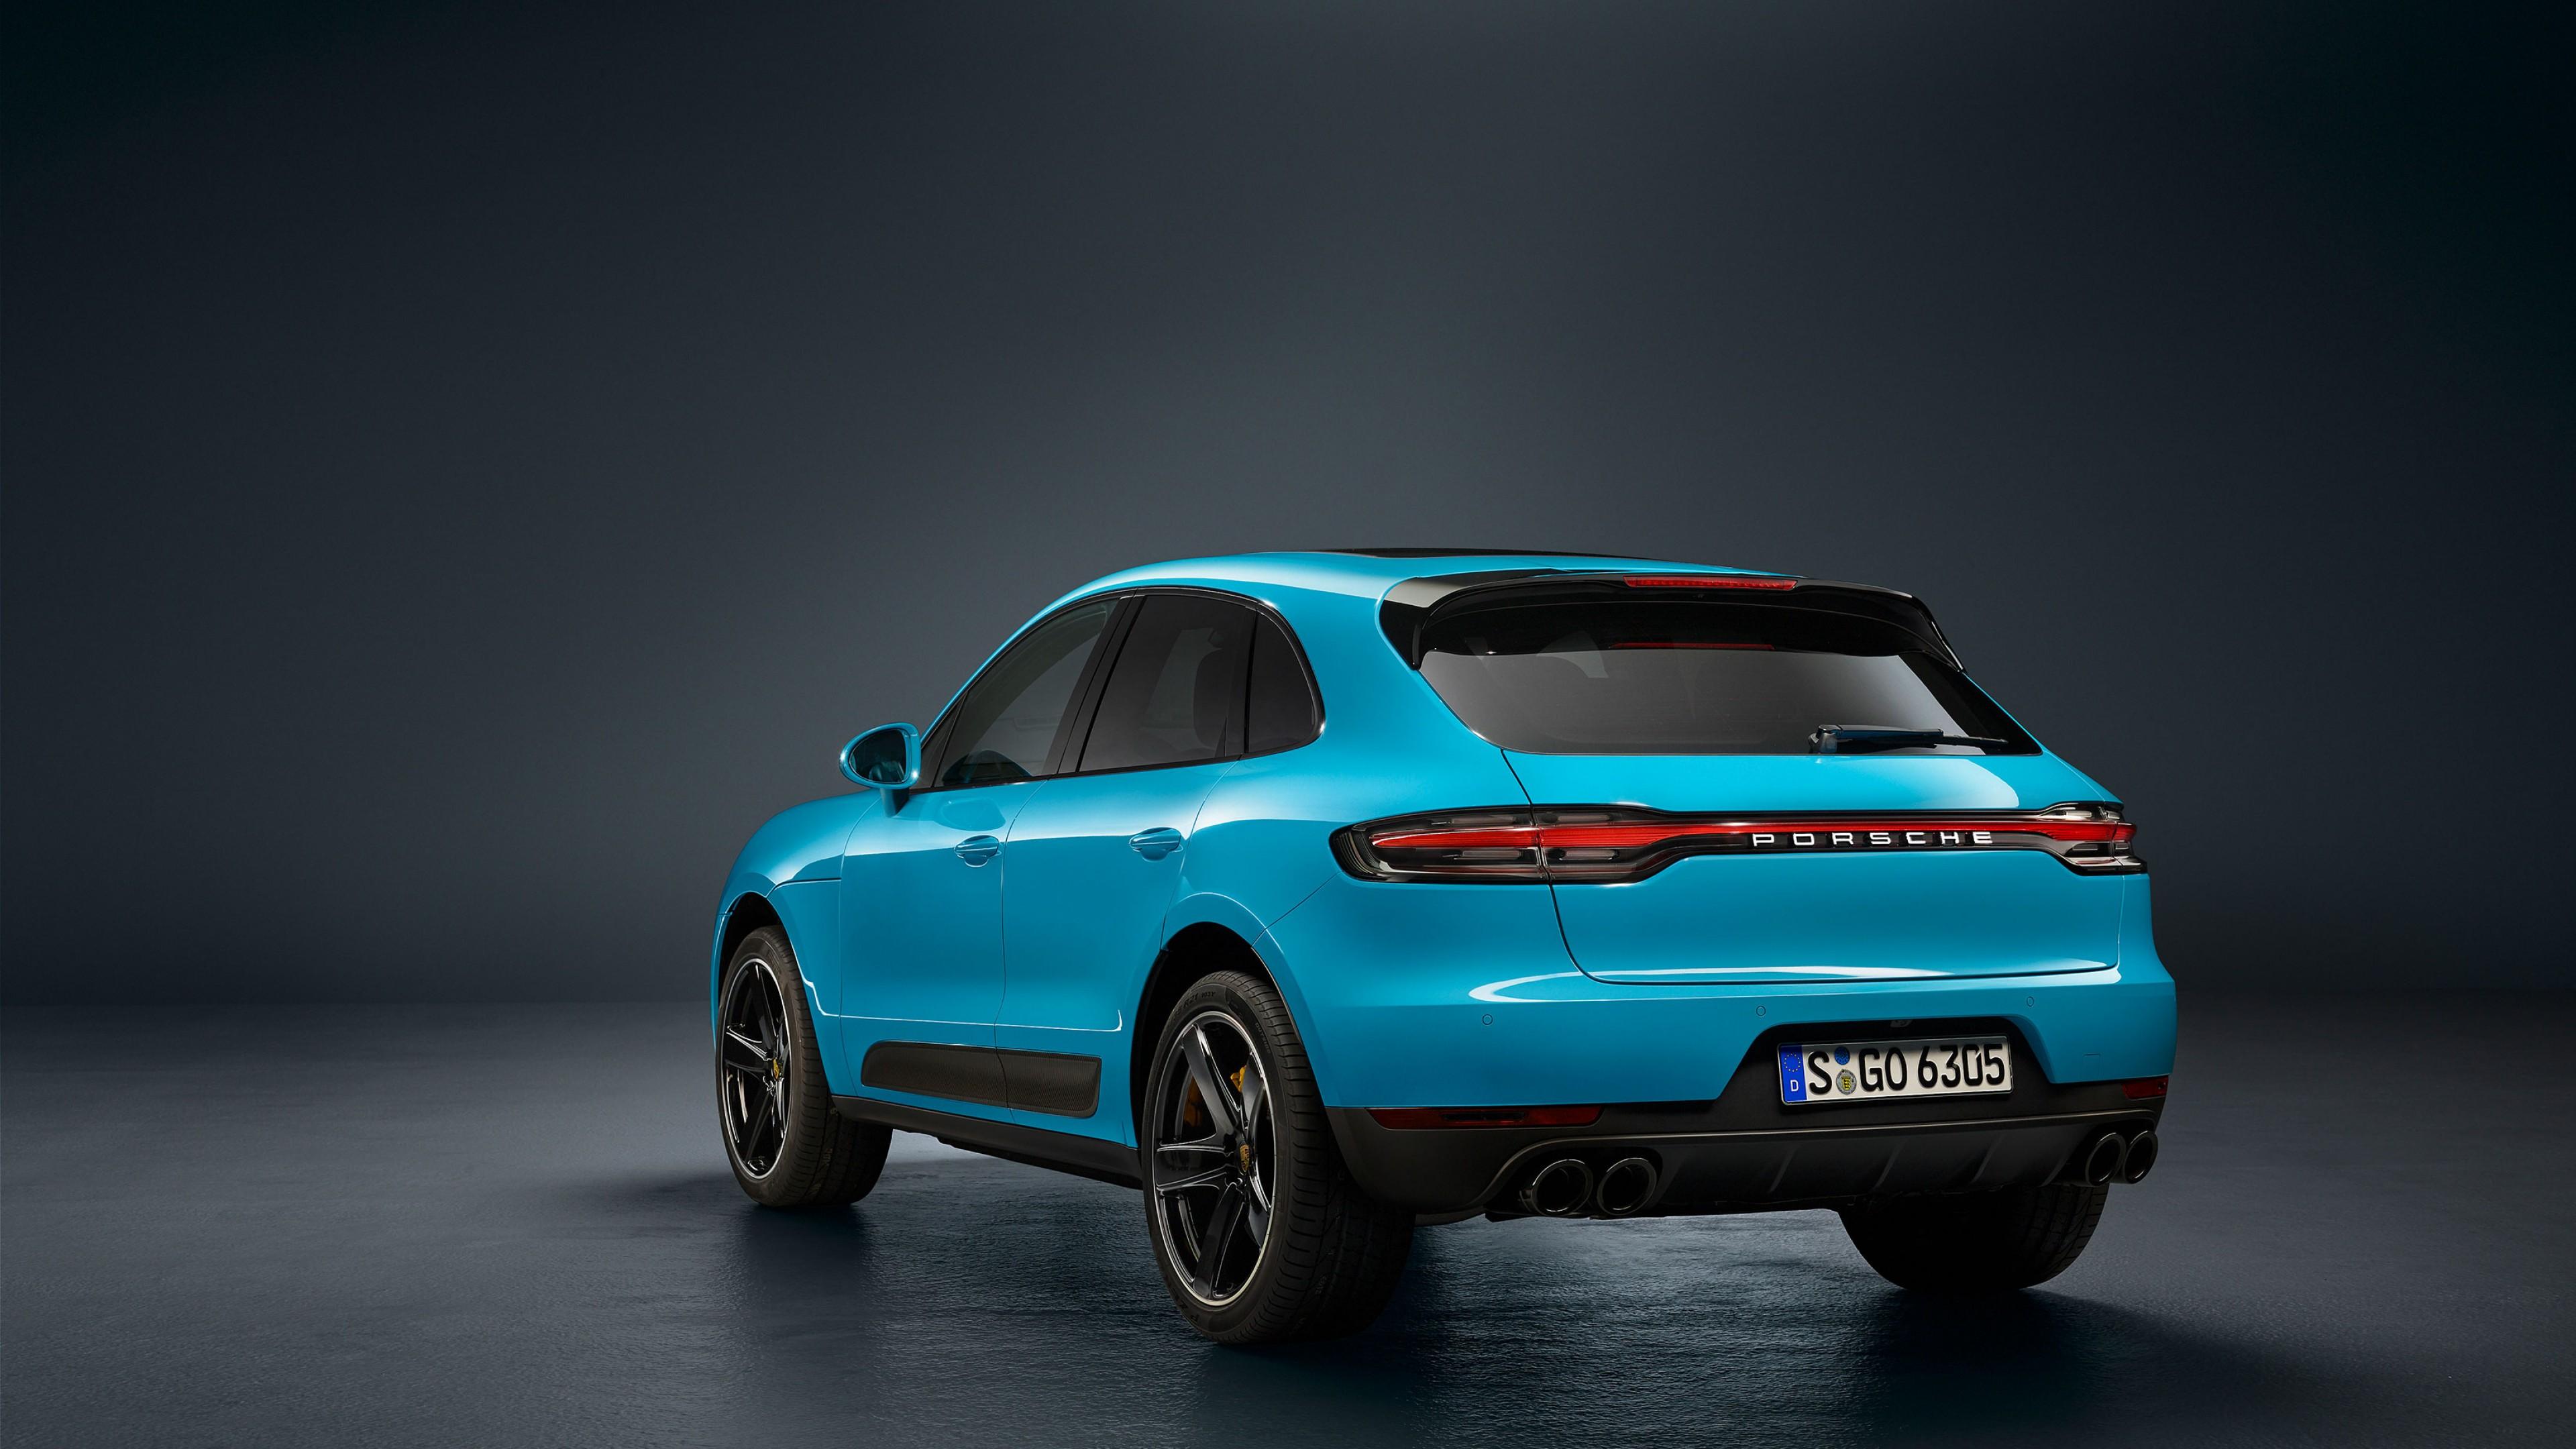 2019 Cars: Wallpaper Porsche Macan, 2019 Cars, SUV, Crossover, 4K